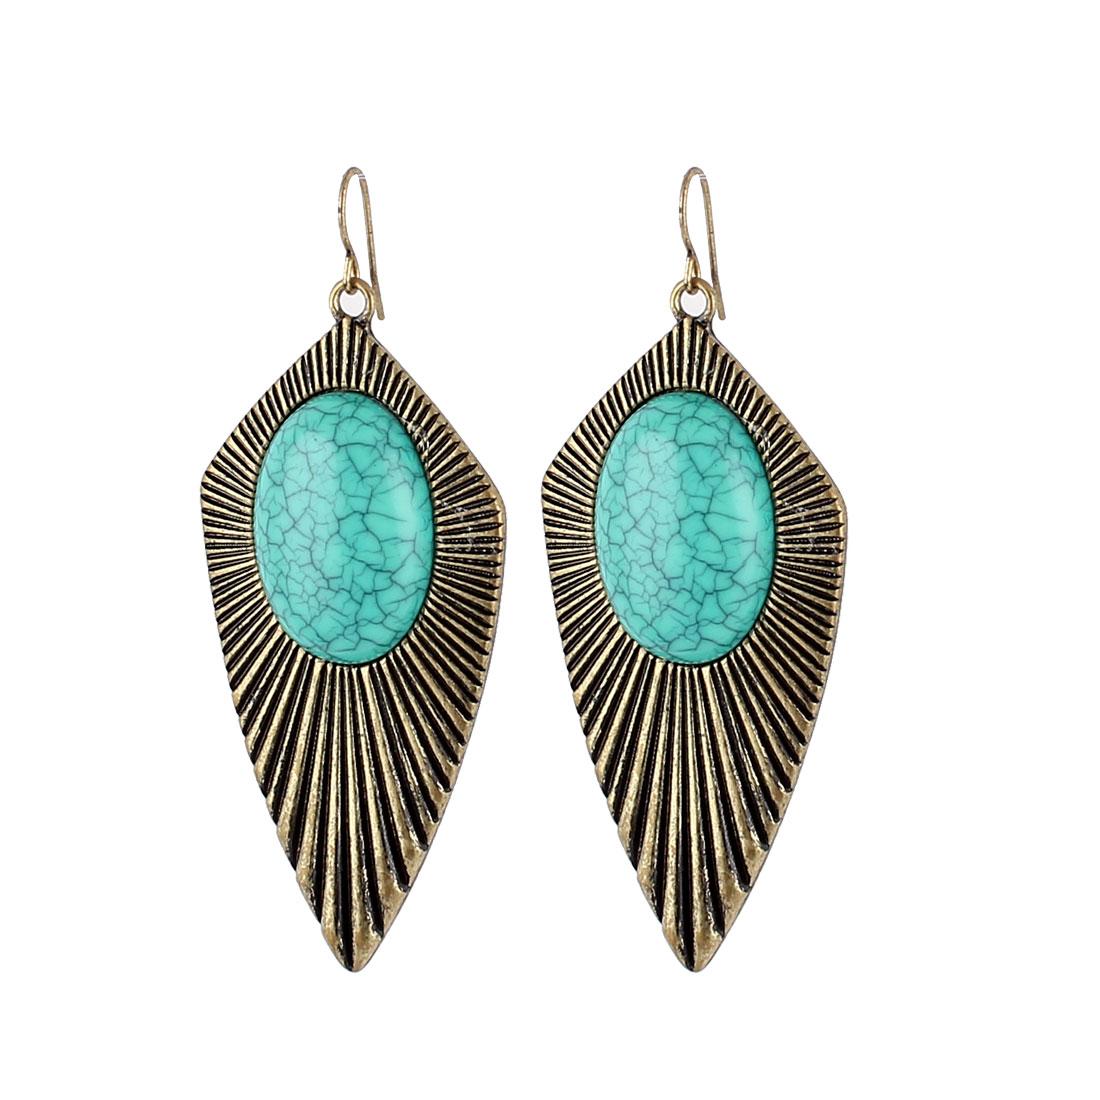 "Women Faux Semicircle Cyan Stone Inlaid Waterdrop Shape Pendant Metal Fish Hook Earrings Earbob Bronze Tone 2.8"" Length Pair"